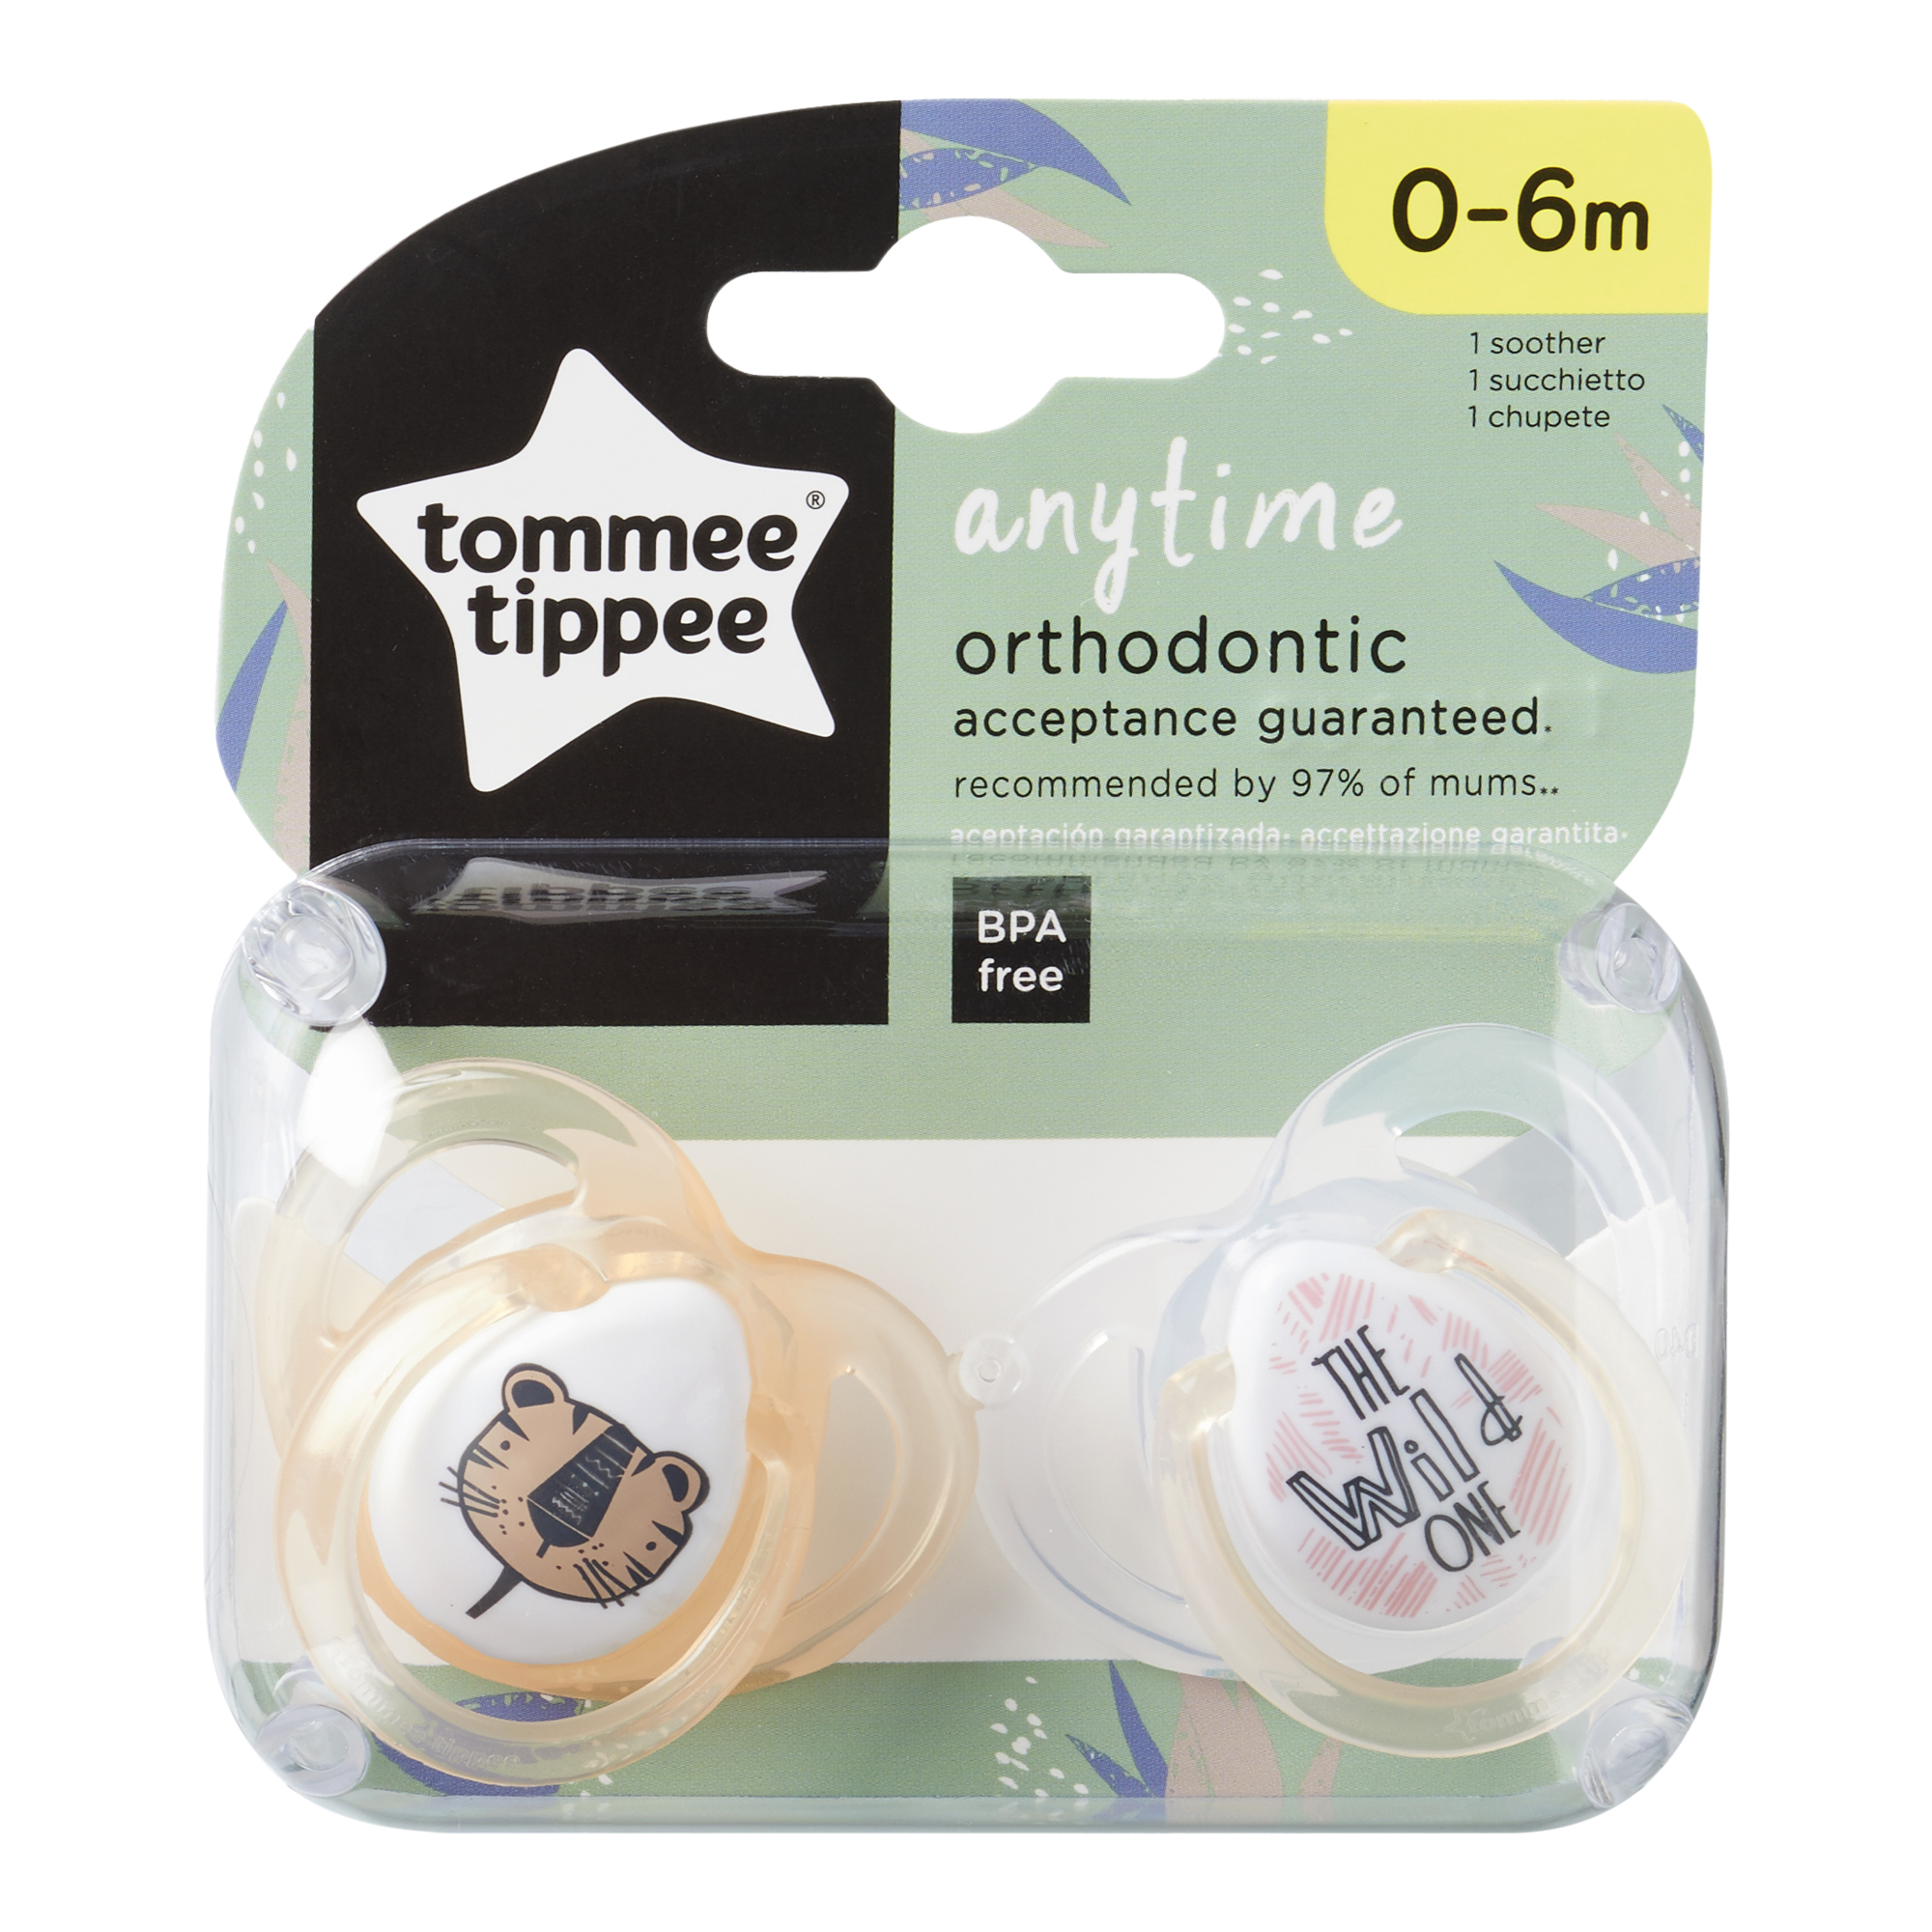 Set Suzete Ortodontice Anytime, Tommee Tippee, 0-6 Luni, 2 buc, Tigrut Portocaliu